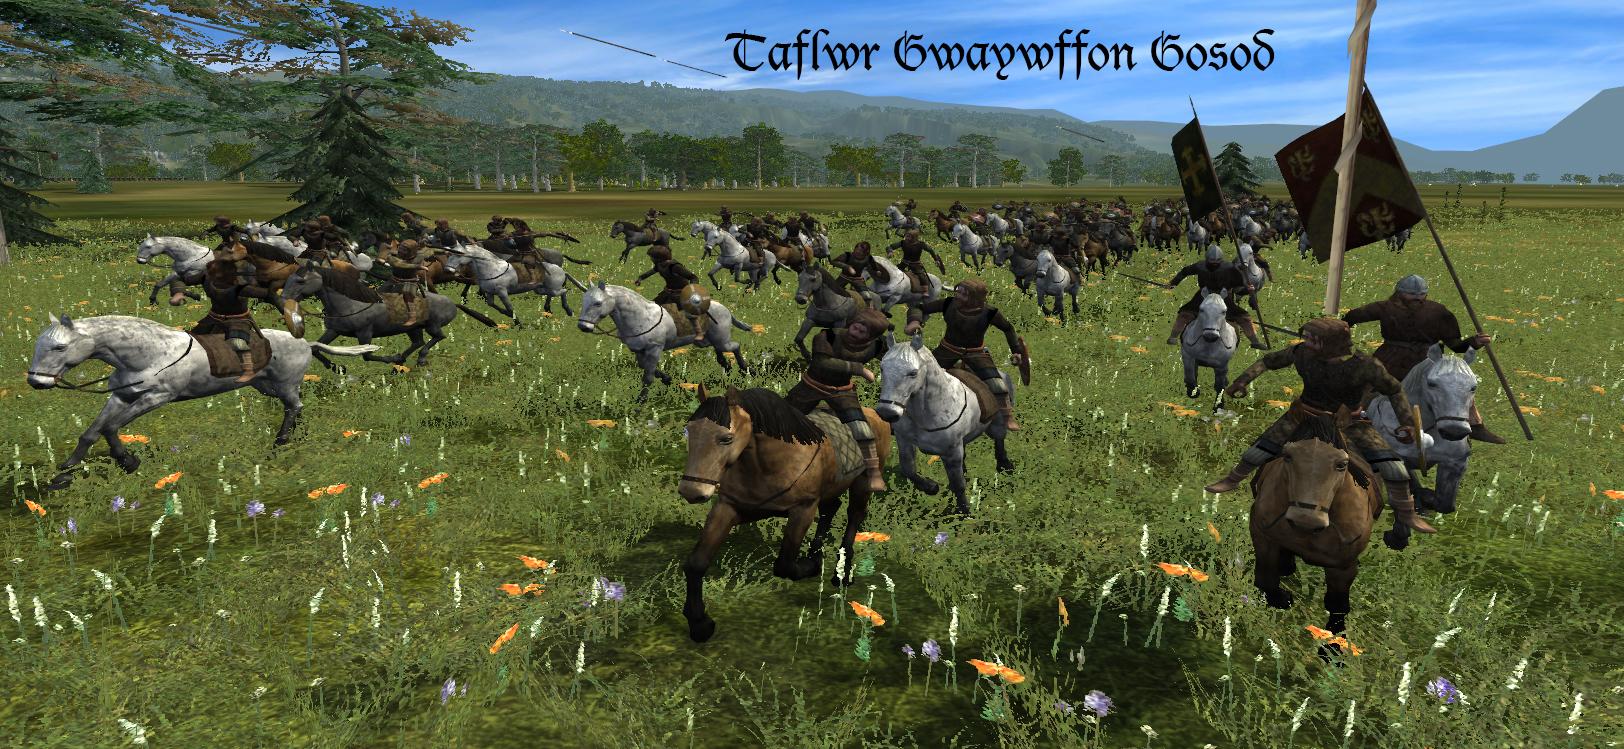 mounted skirmishers